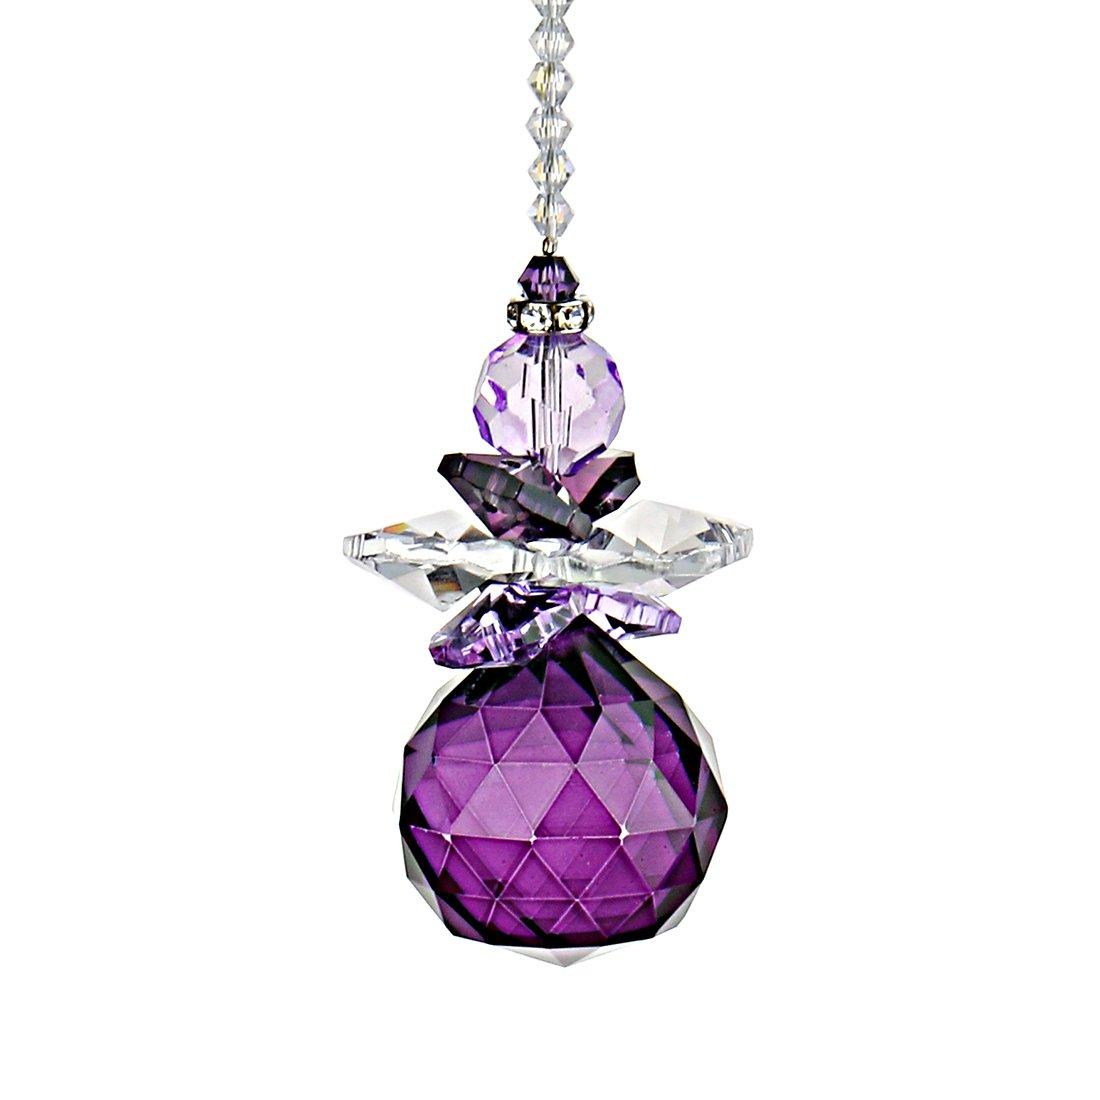 H&D Hanging Crystal Angel Suncatcher Rainbow Maker Guardian Angel Ornament for Home Window Decor (Purple)